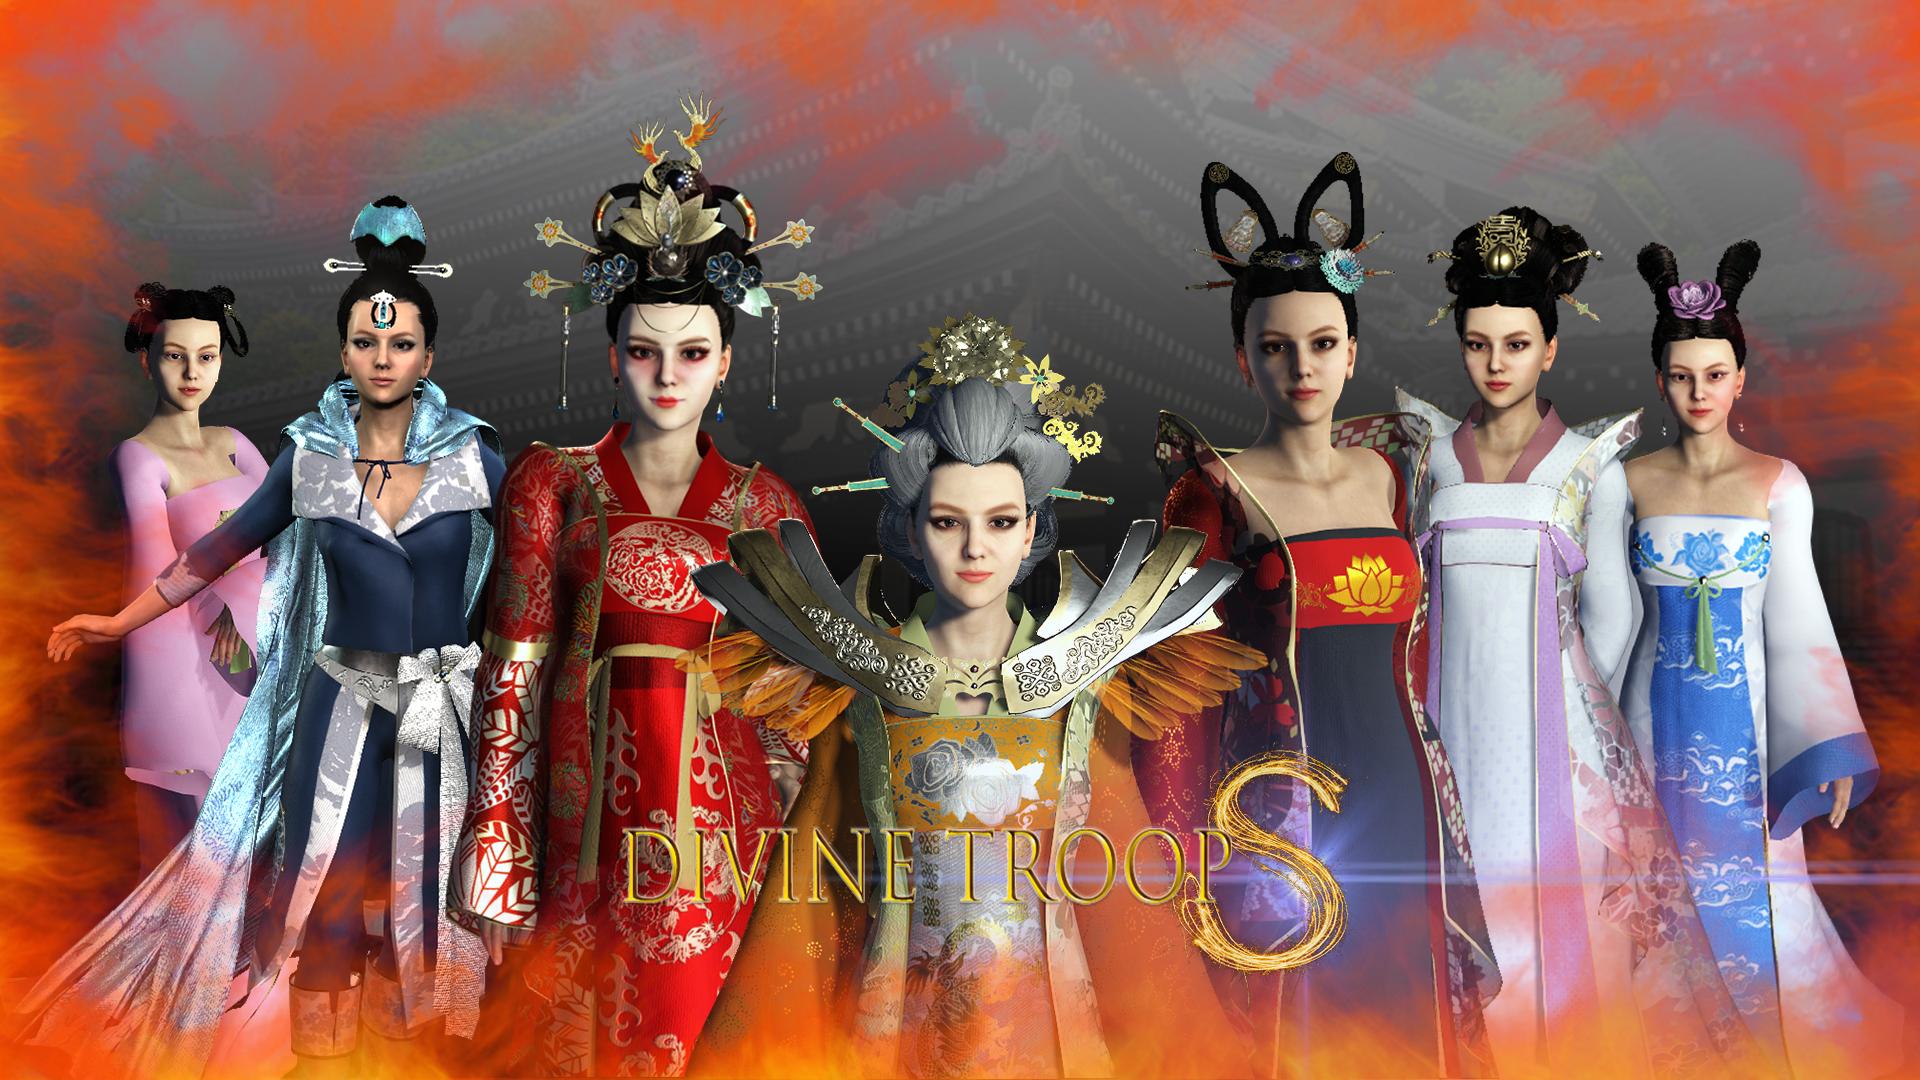 Divine Troop Super - Ancient Empress